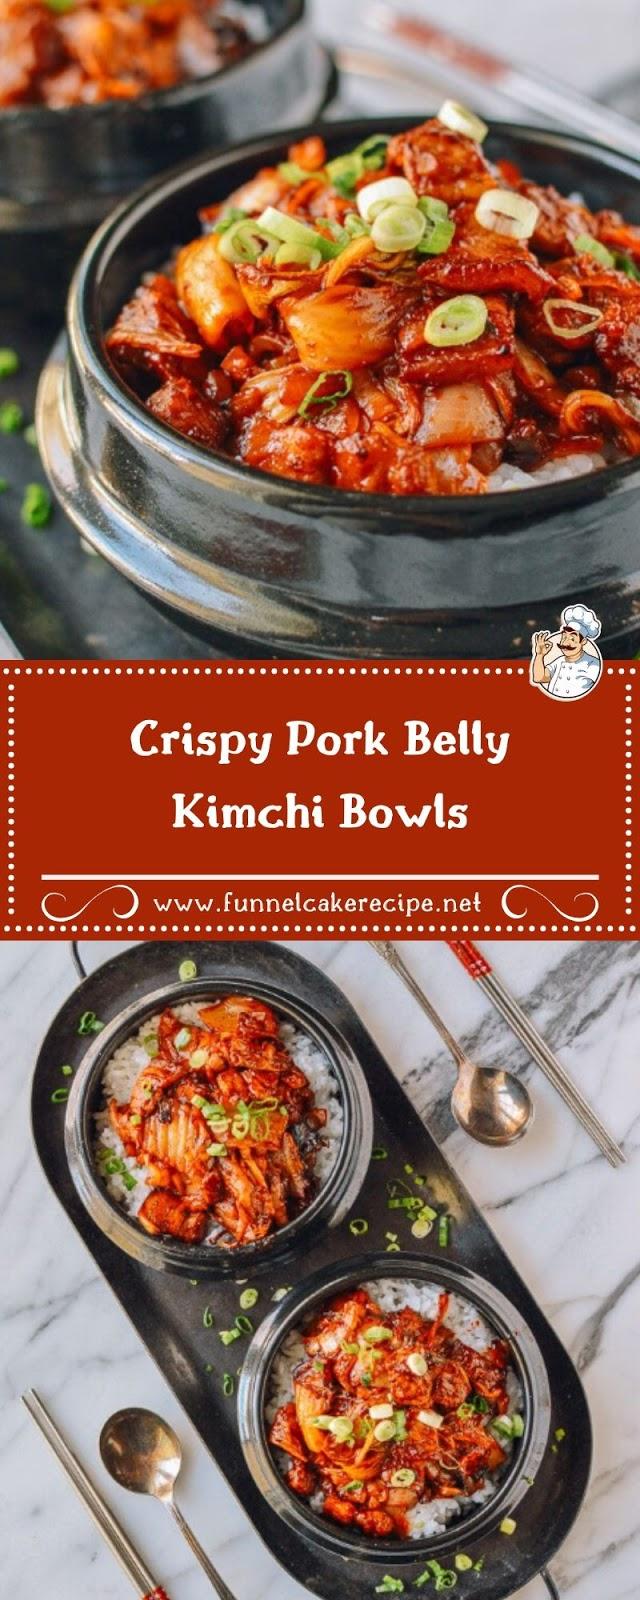 Crispy Pork Belly Kimchi Bowls